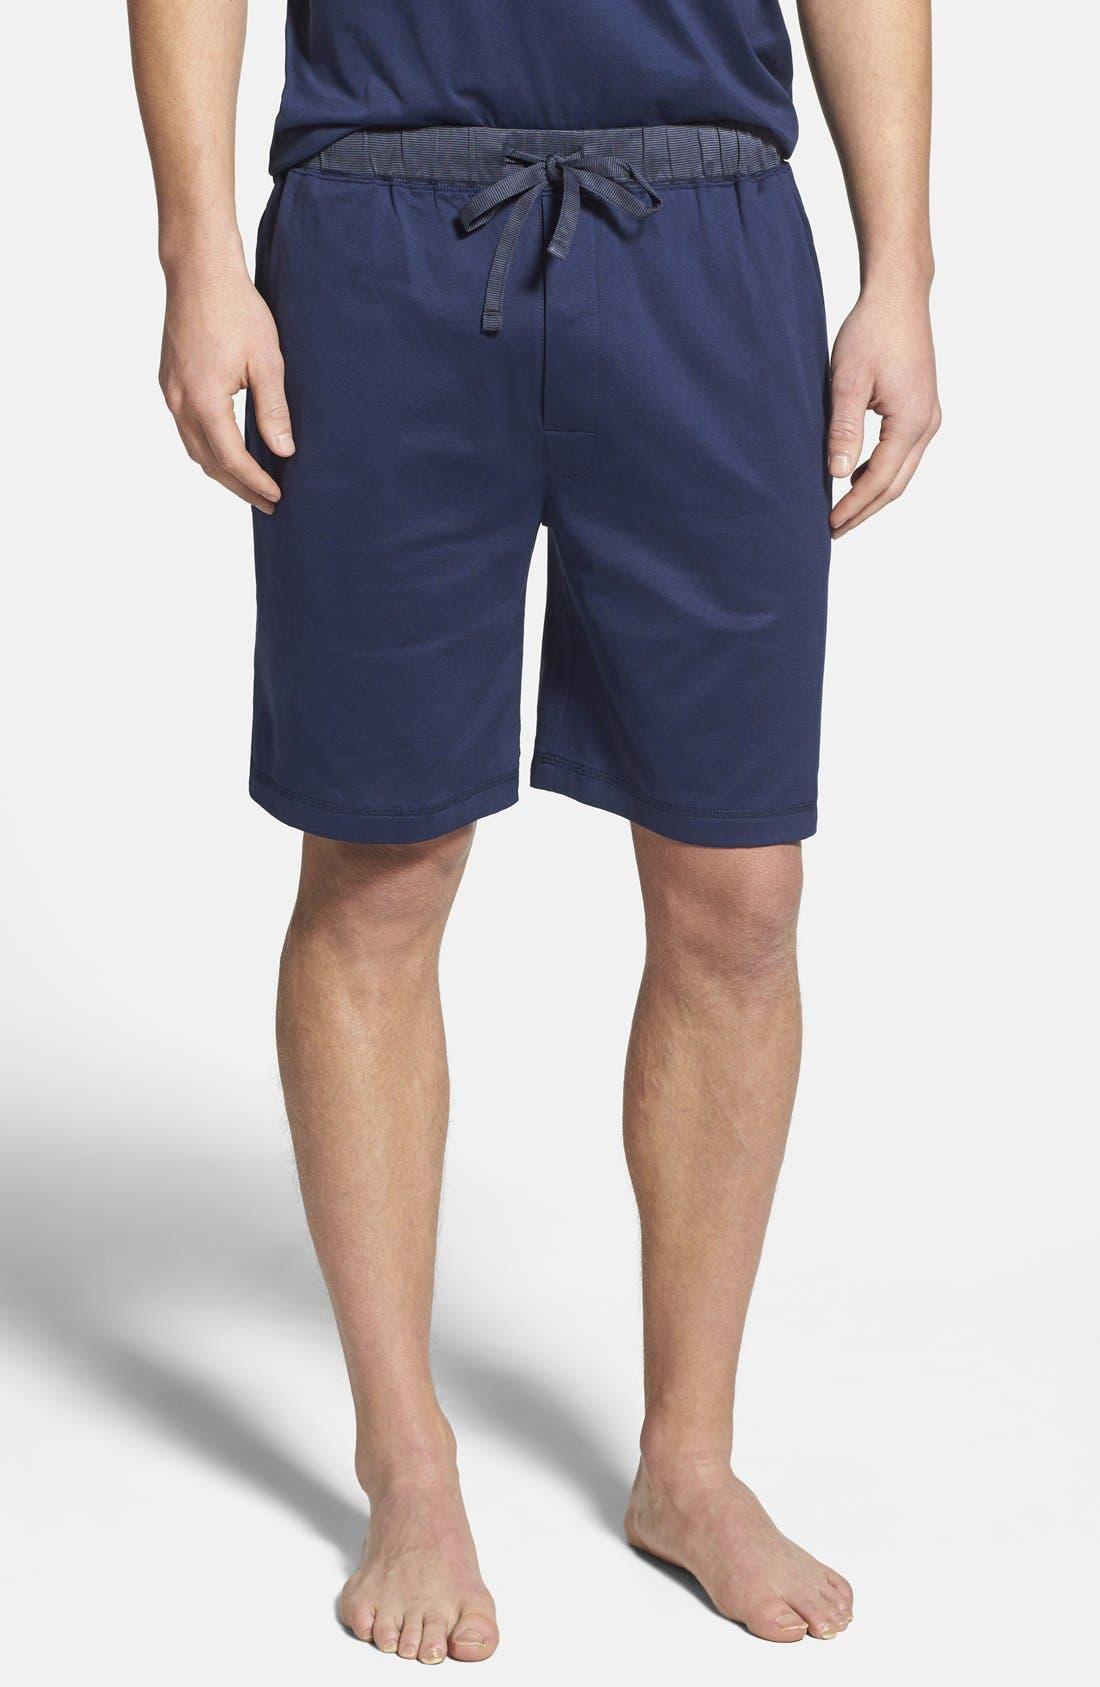 Majestic International 'Down Time' Knit Lounge Shorts